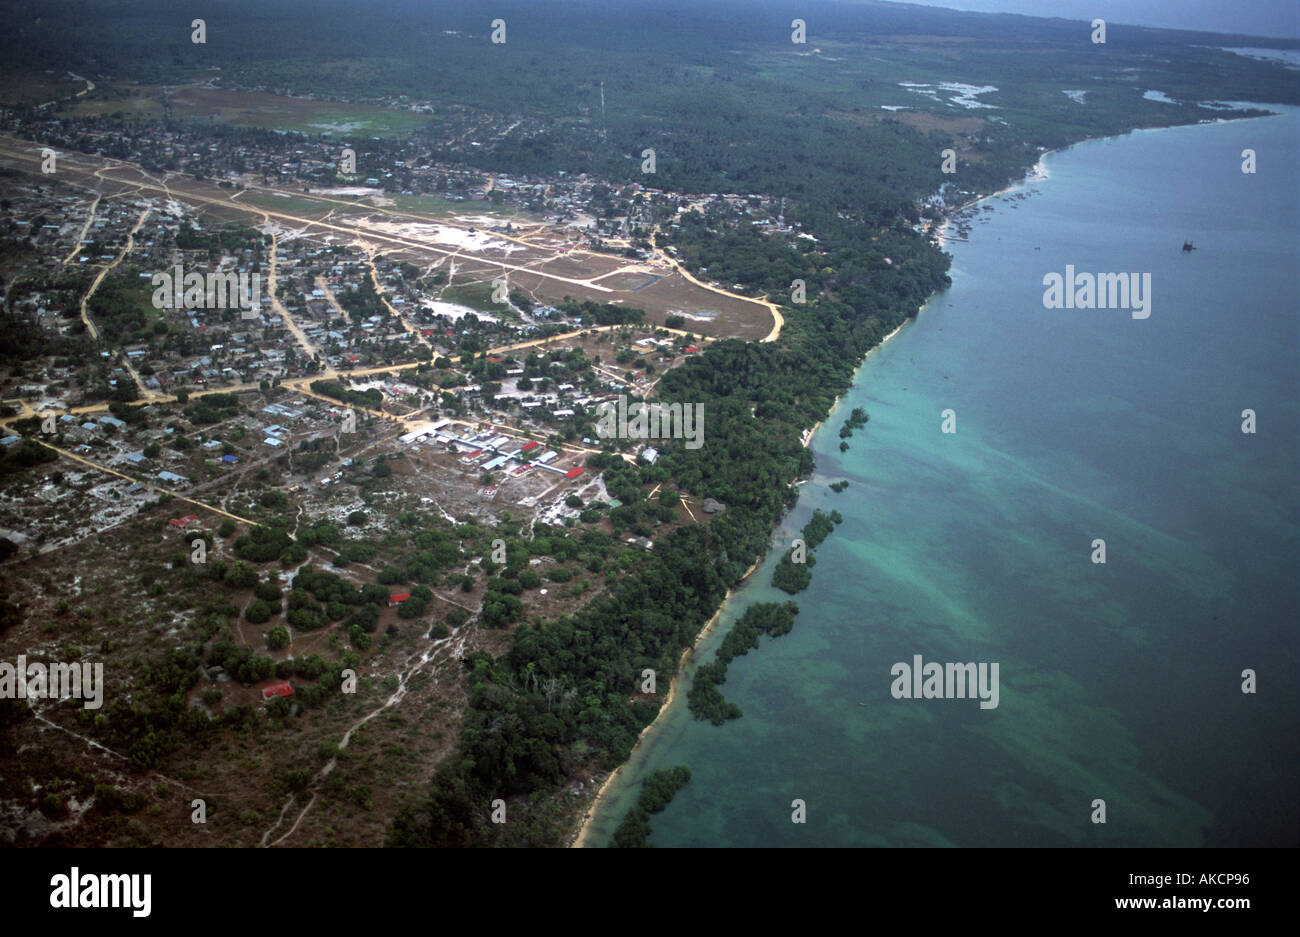 Aerial view of the coast of Mafia island Kilindoni capital of Mafia and her airstrip Indian Ocean Tanzania East Africa - Stock Image